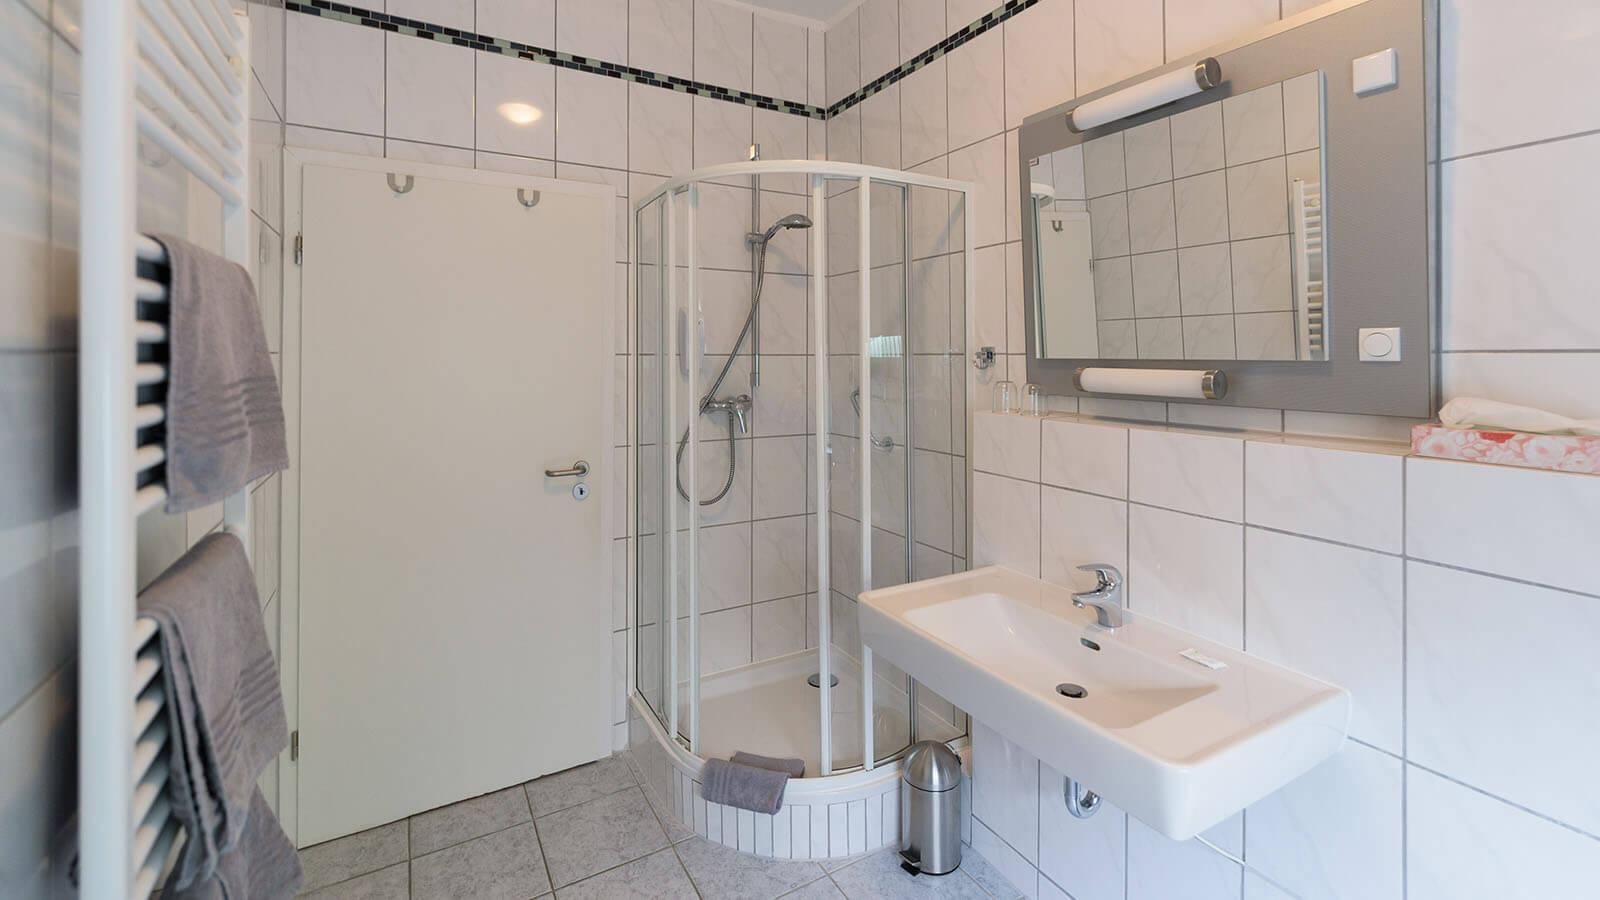 Badezimmer im Hotel Goethe Haus